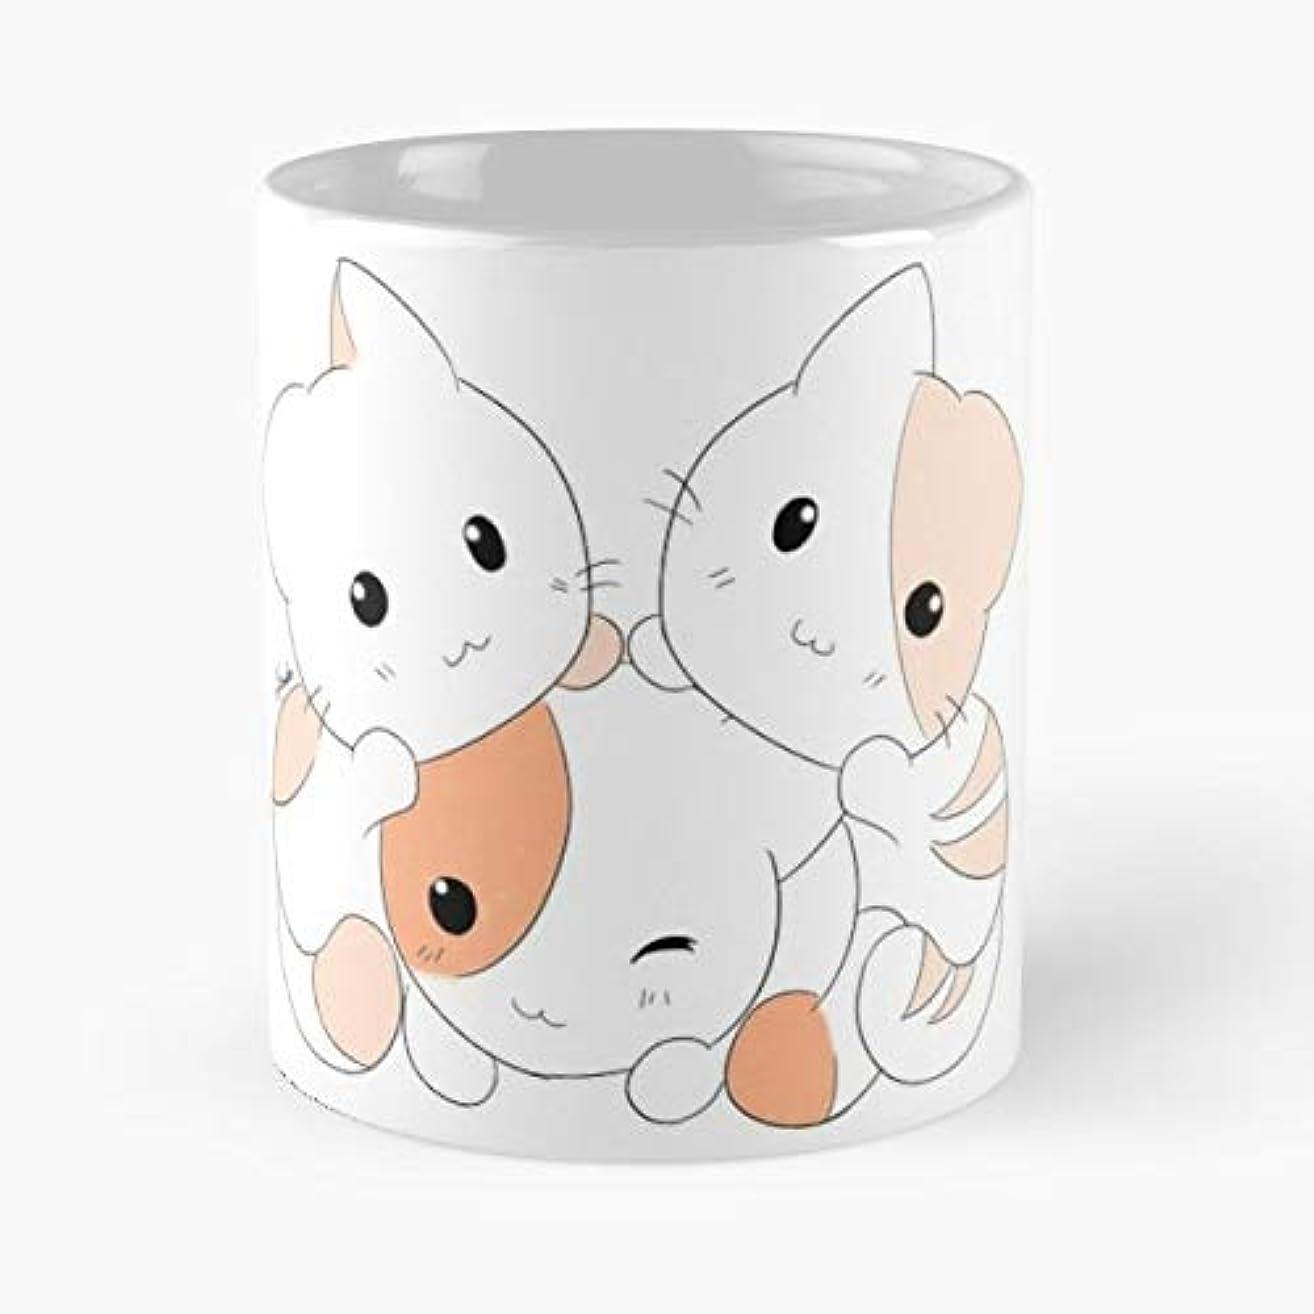 Cat Cats Neko Cute -funny Gifts For Men And Women Gift Coffee Mug Tea Cup White-11 Oz.